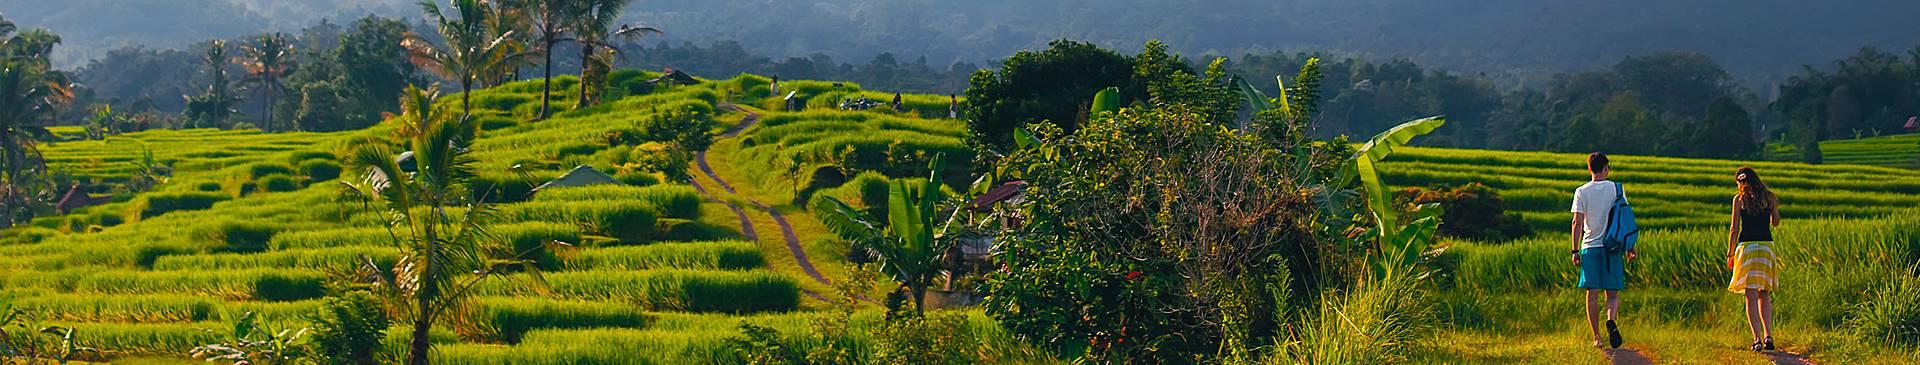 Voyage de noces à Bali